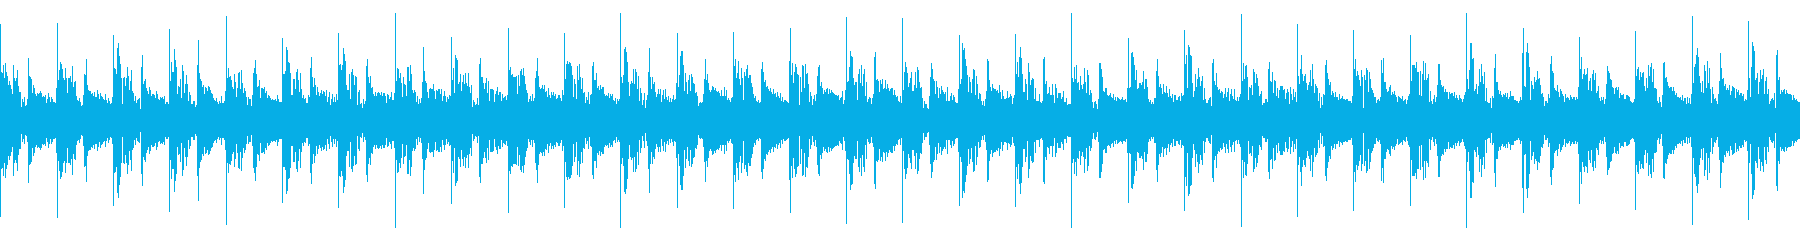 DeepHouse 静かなクラブビートの再生済みの波形